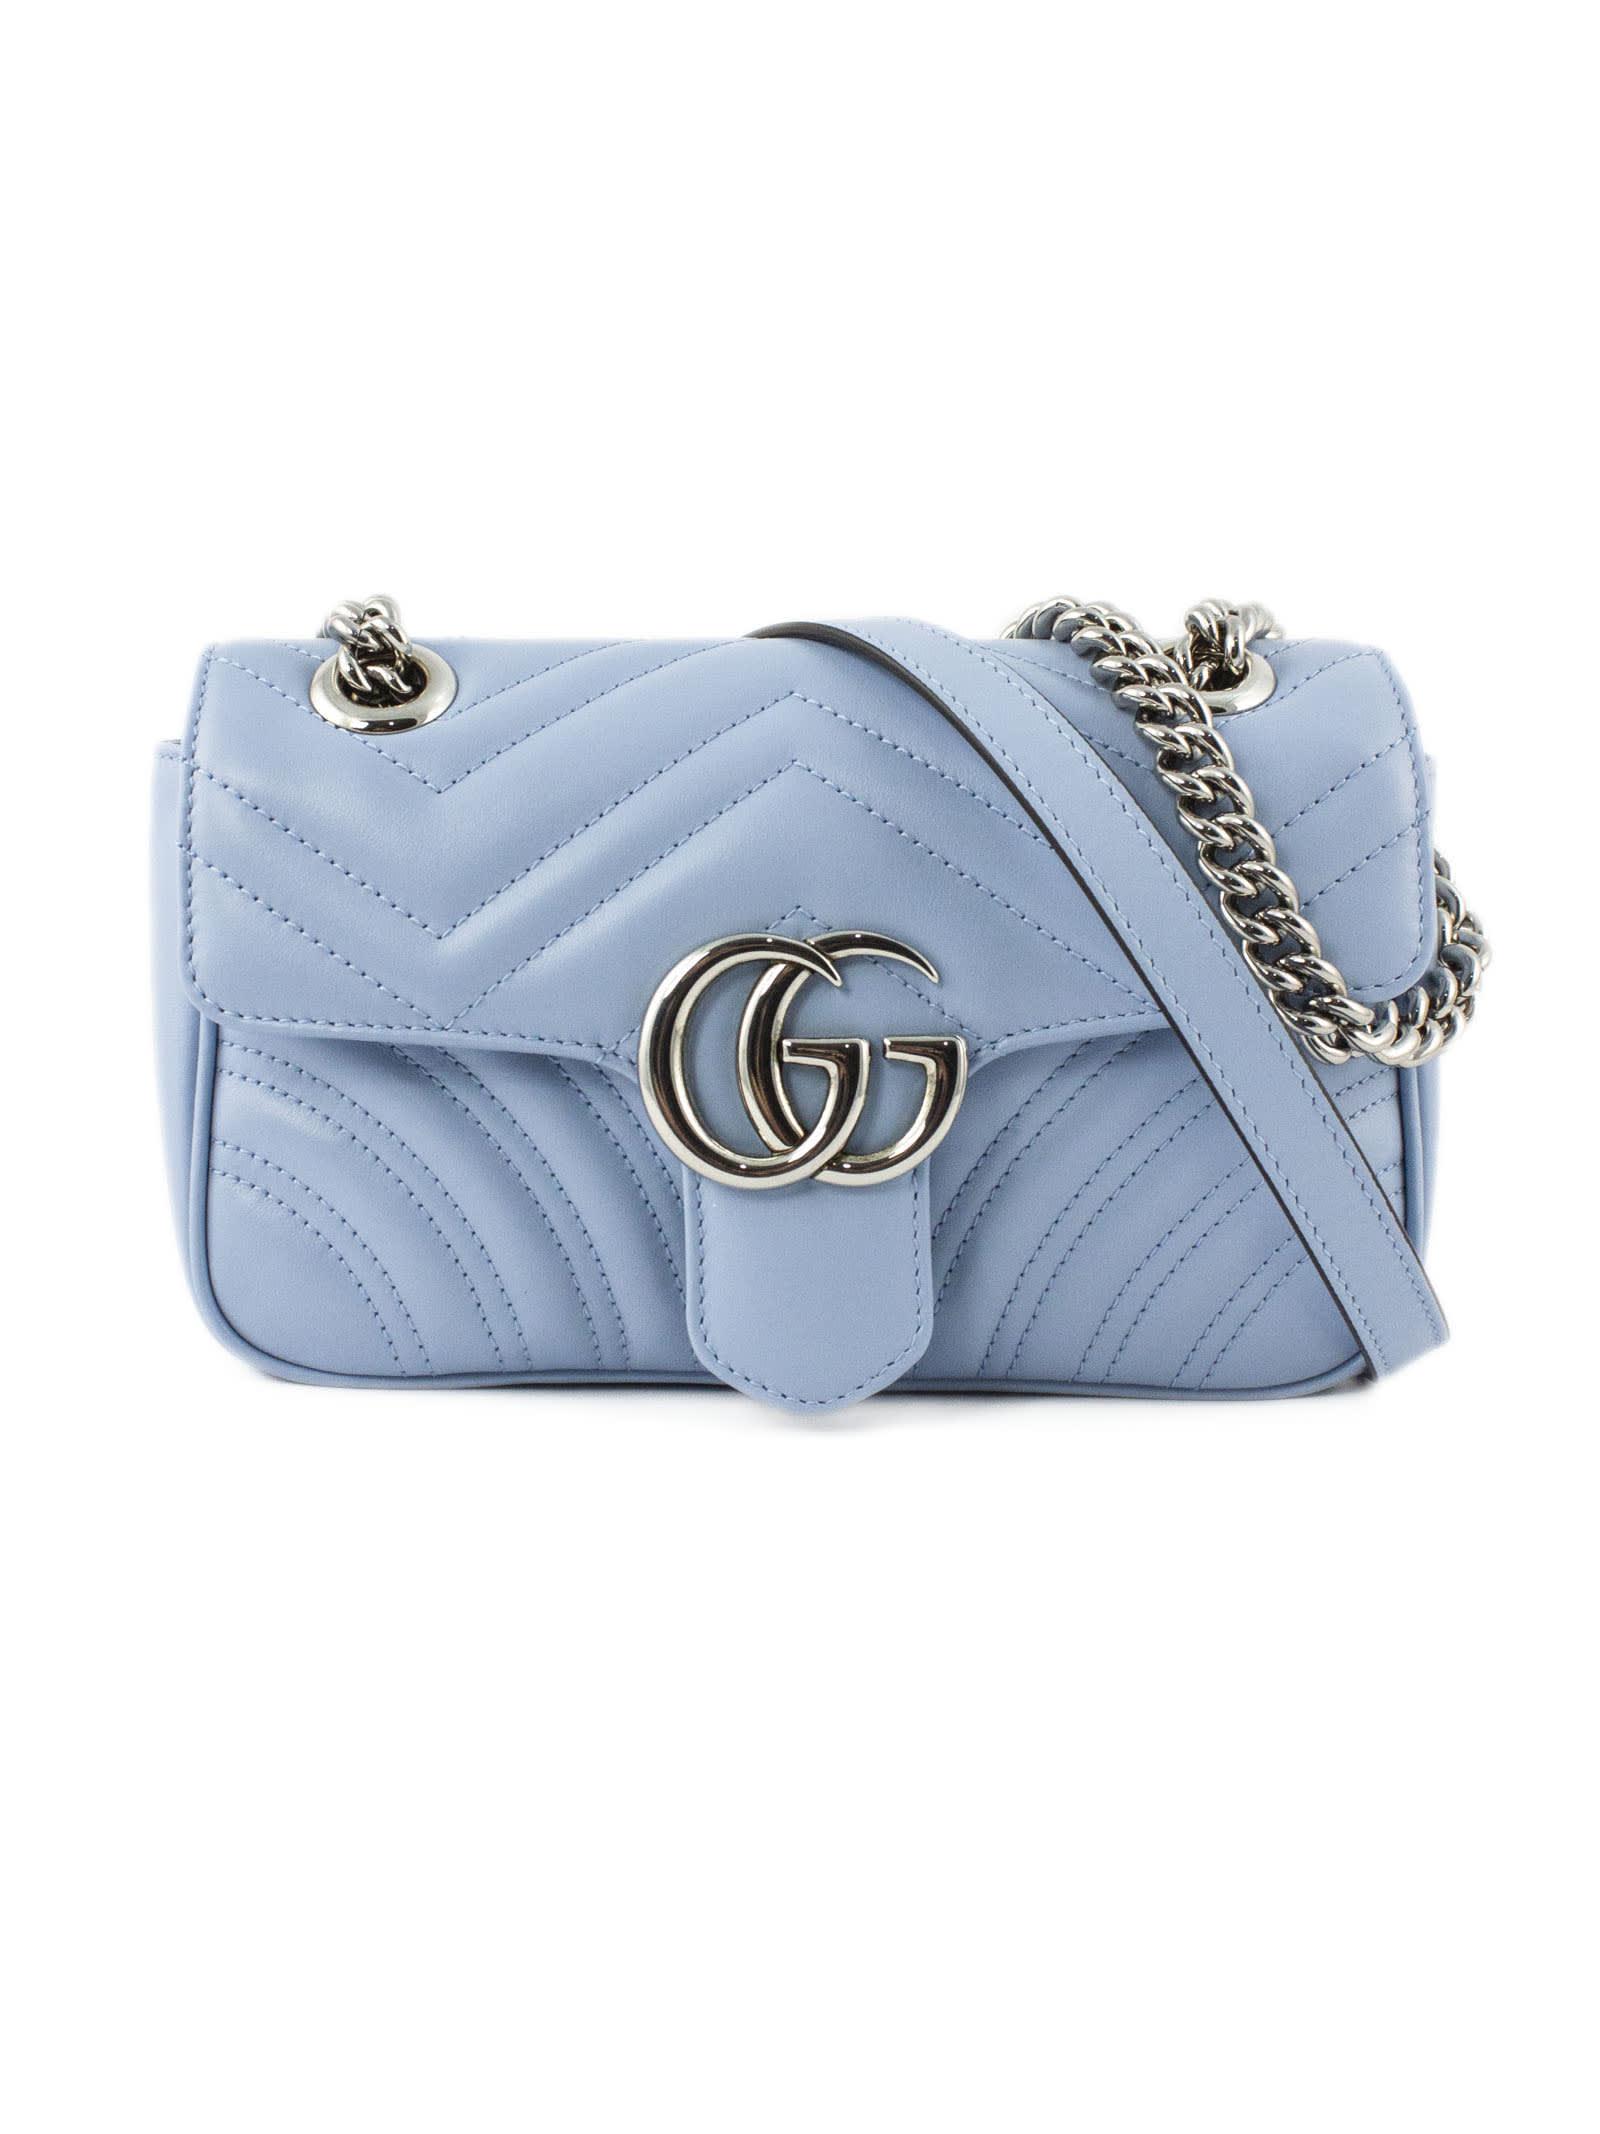 Gucci Gg Marmont Pastel Blue Mini Bag